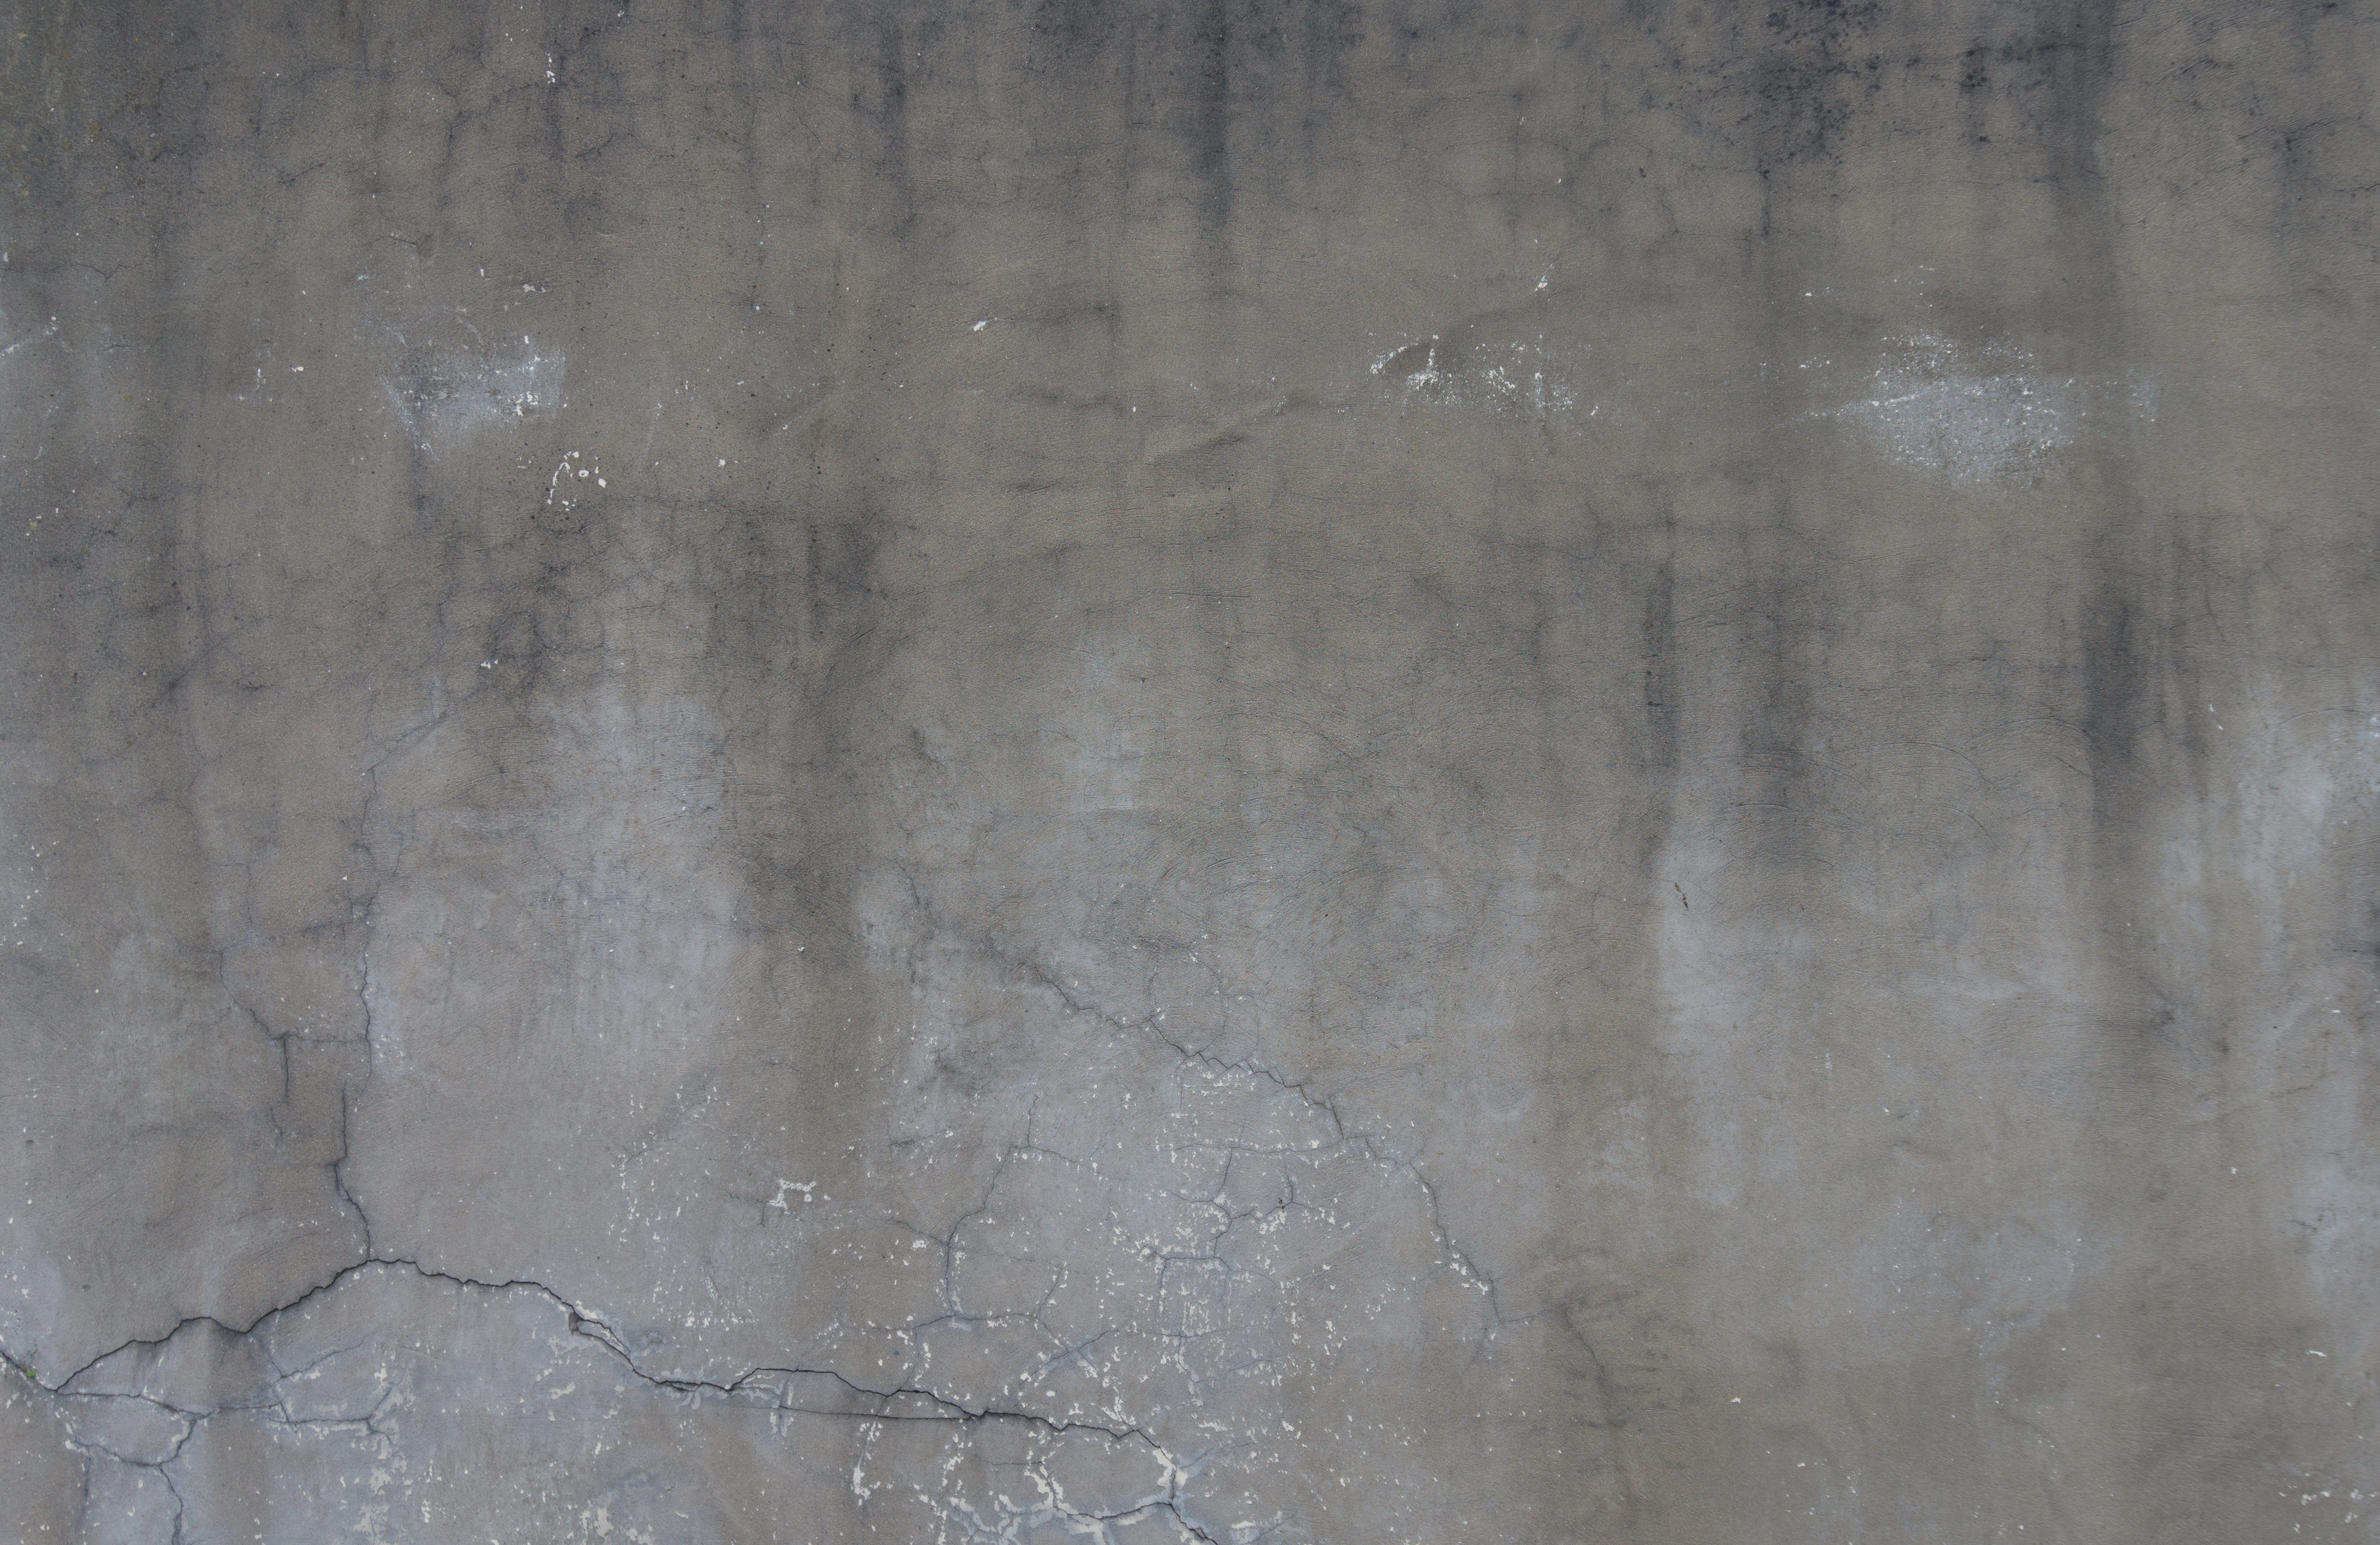 Concrete Wall Concrete Texturify Free Textures